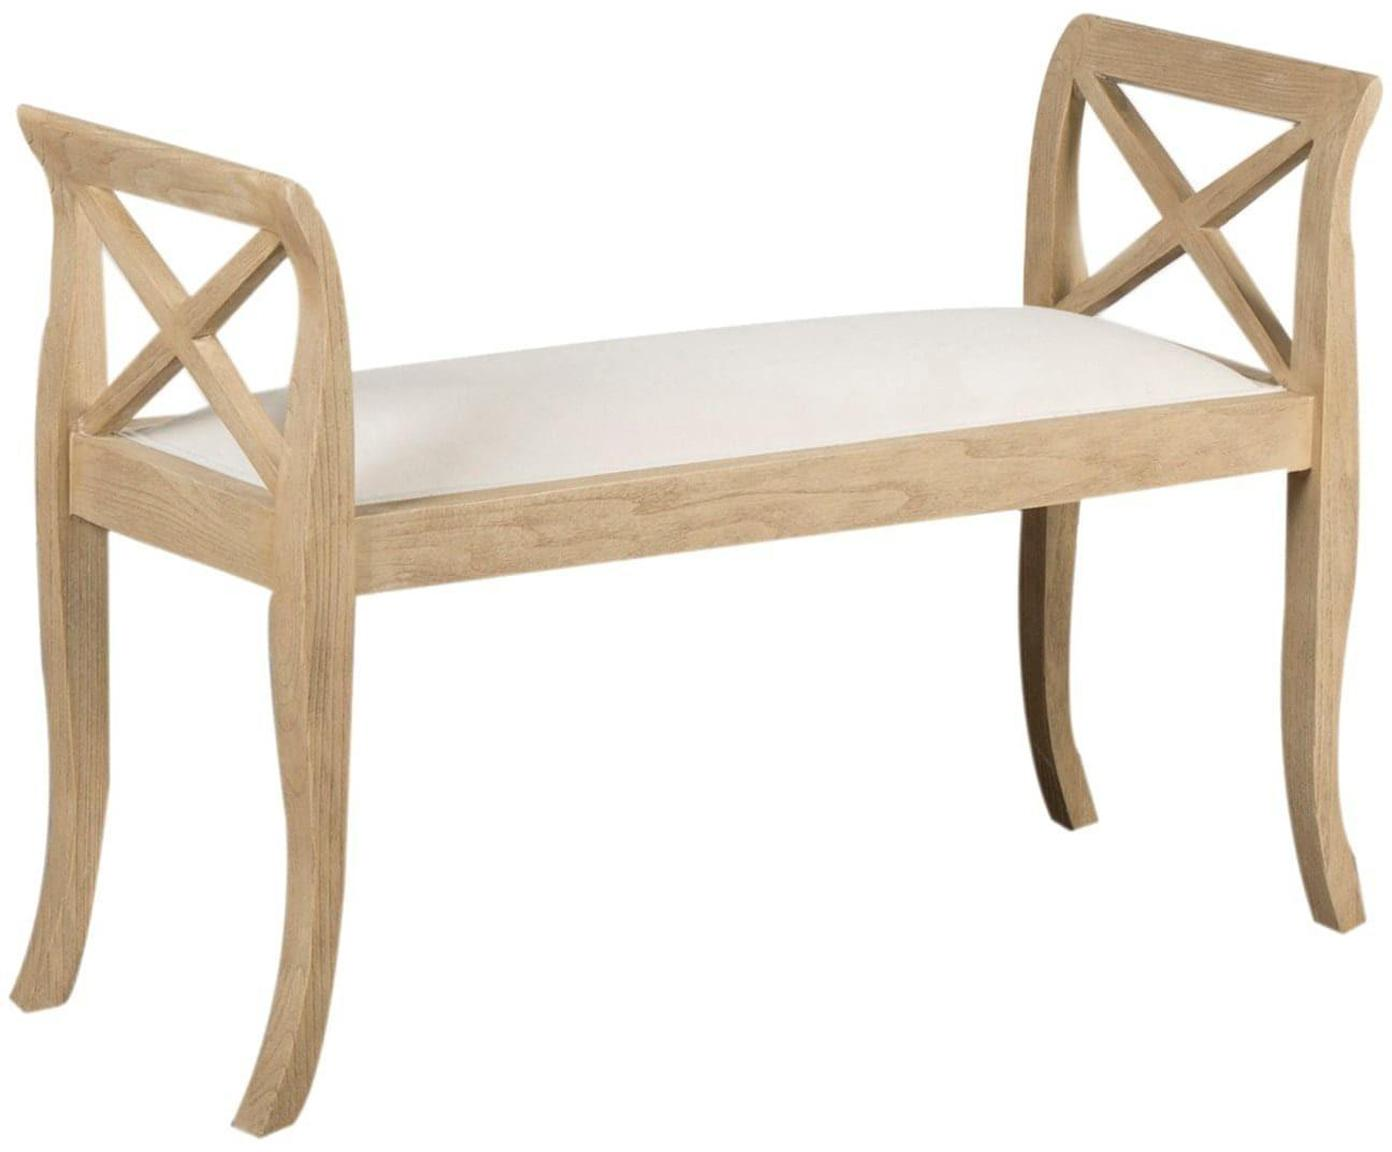 Banco de madera de roble Colony, Tapizado: algodón, Estructura: madera de roble pintada, Blanco, beige, An 92 x Al 64 cm